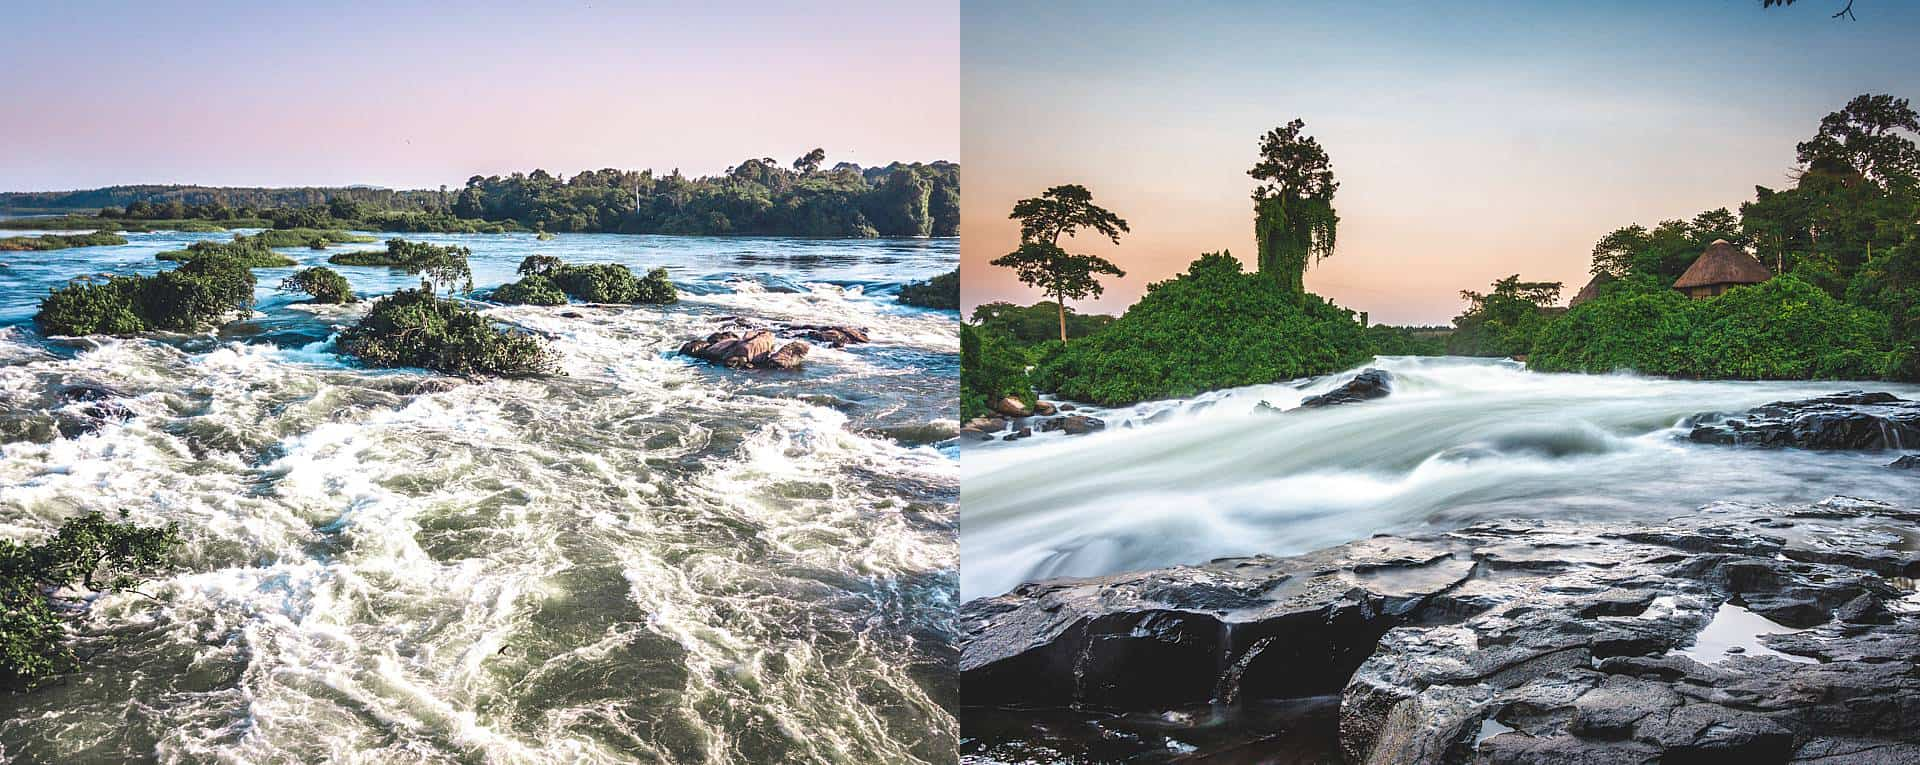 Nile River Near Jinja